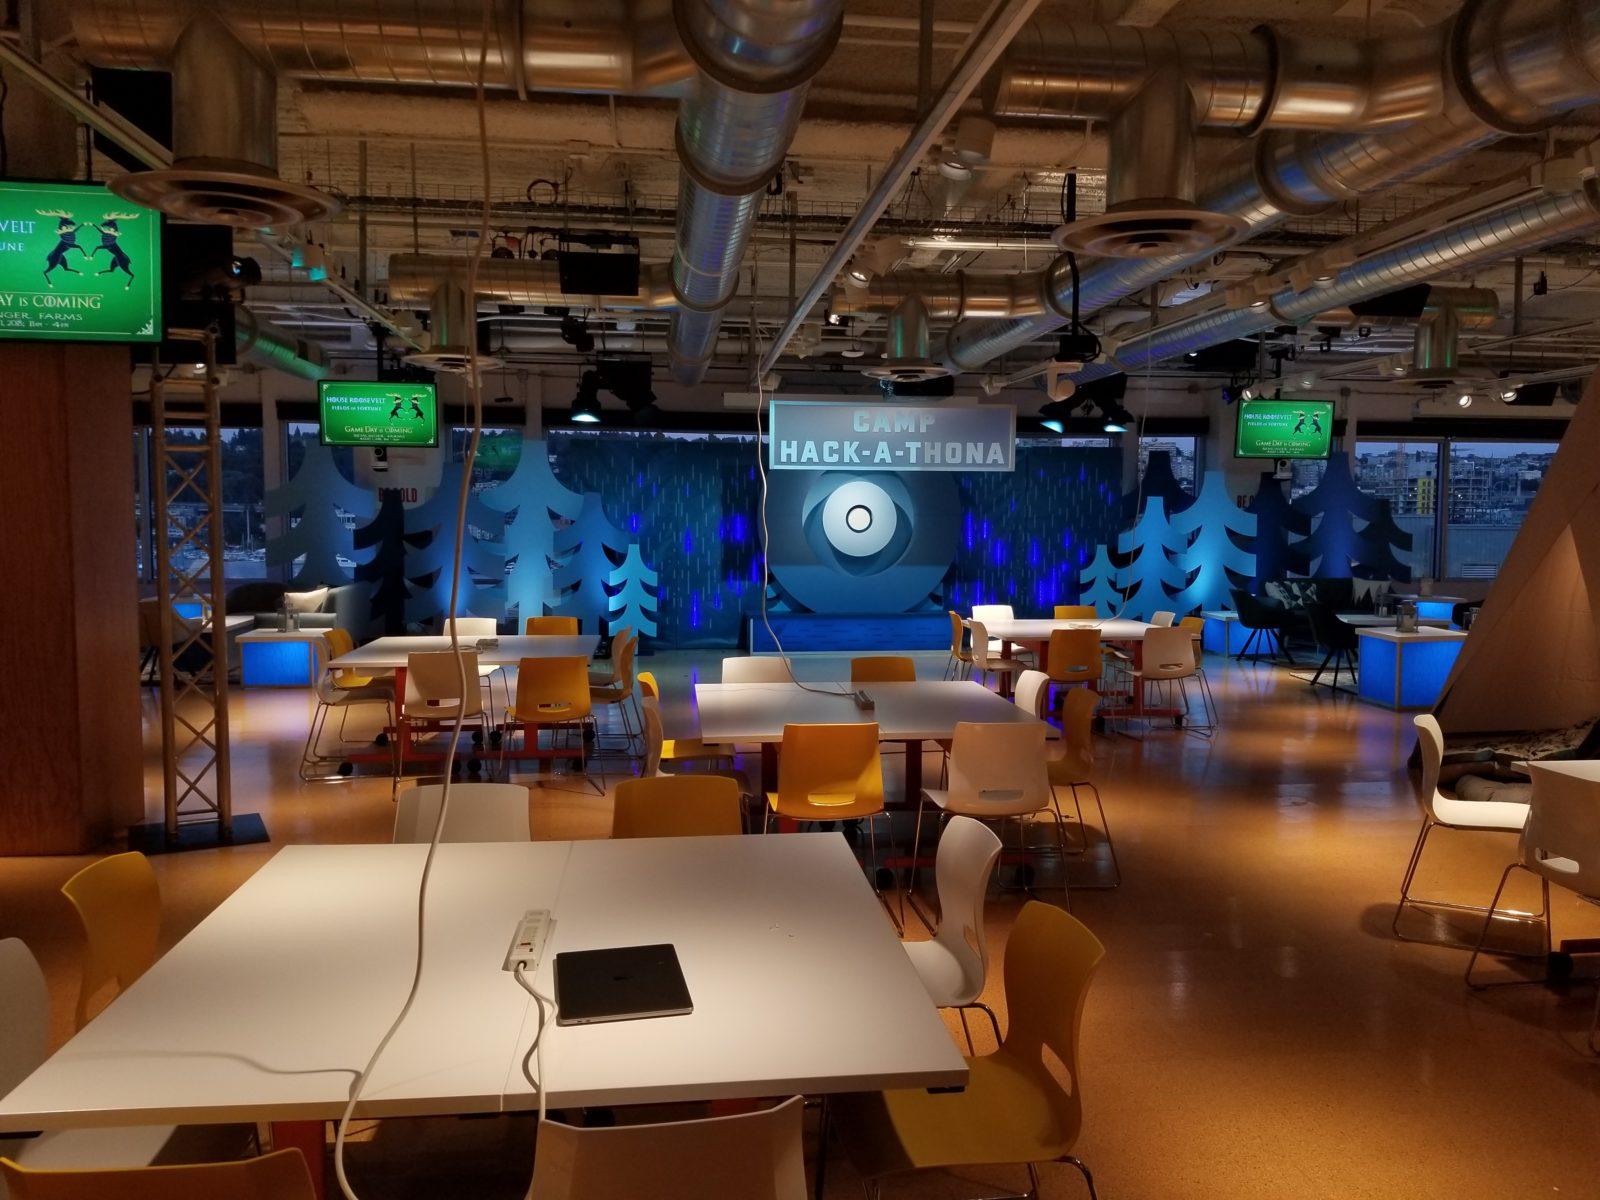 Facebook Hack Event